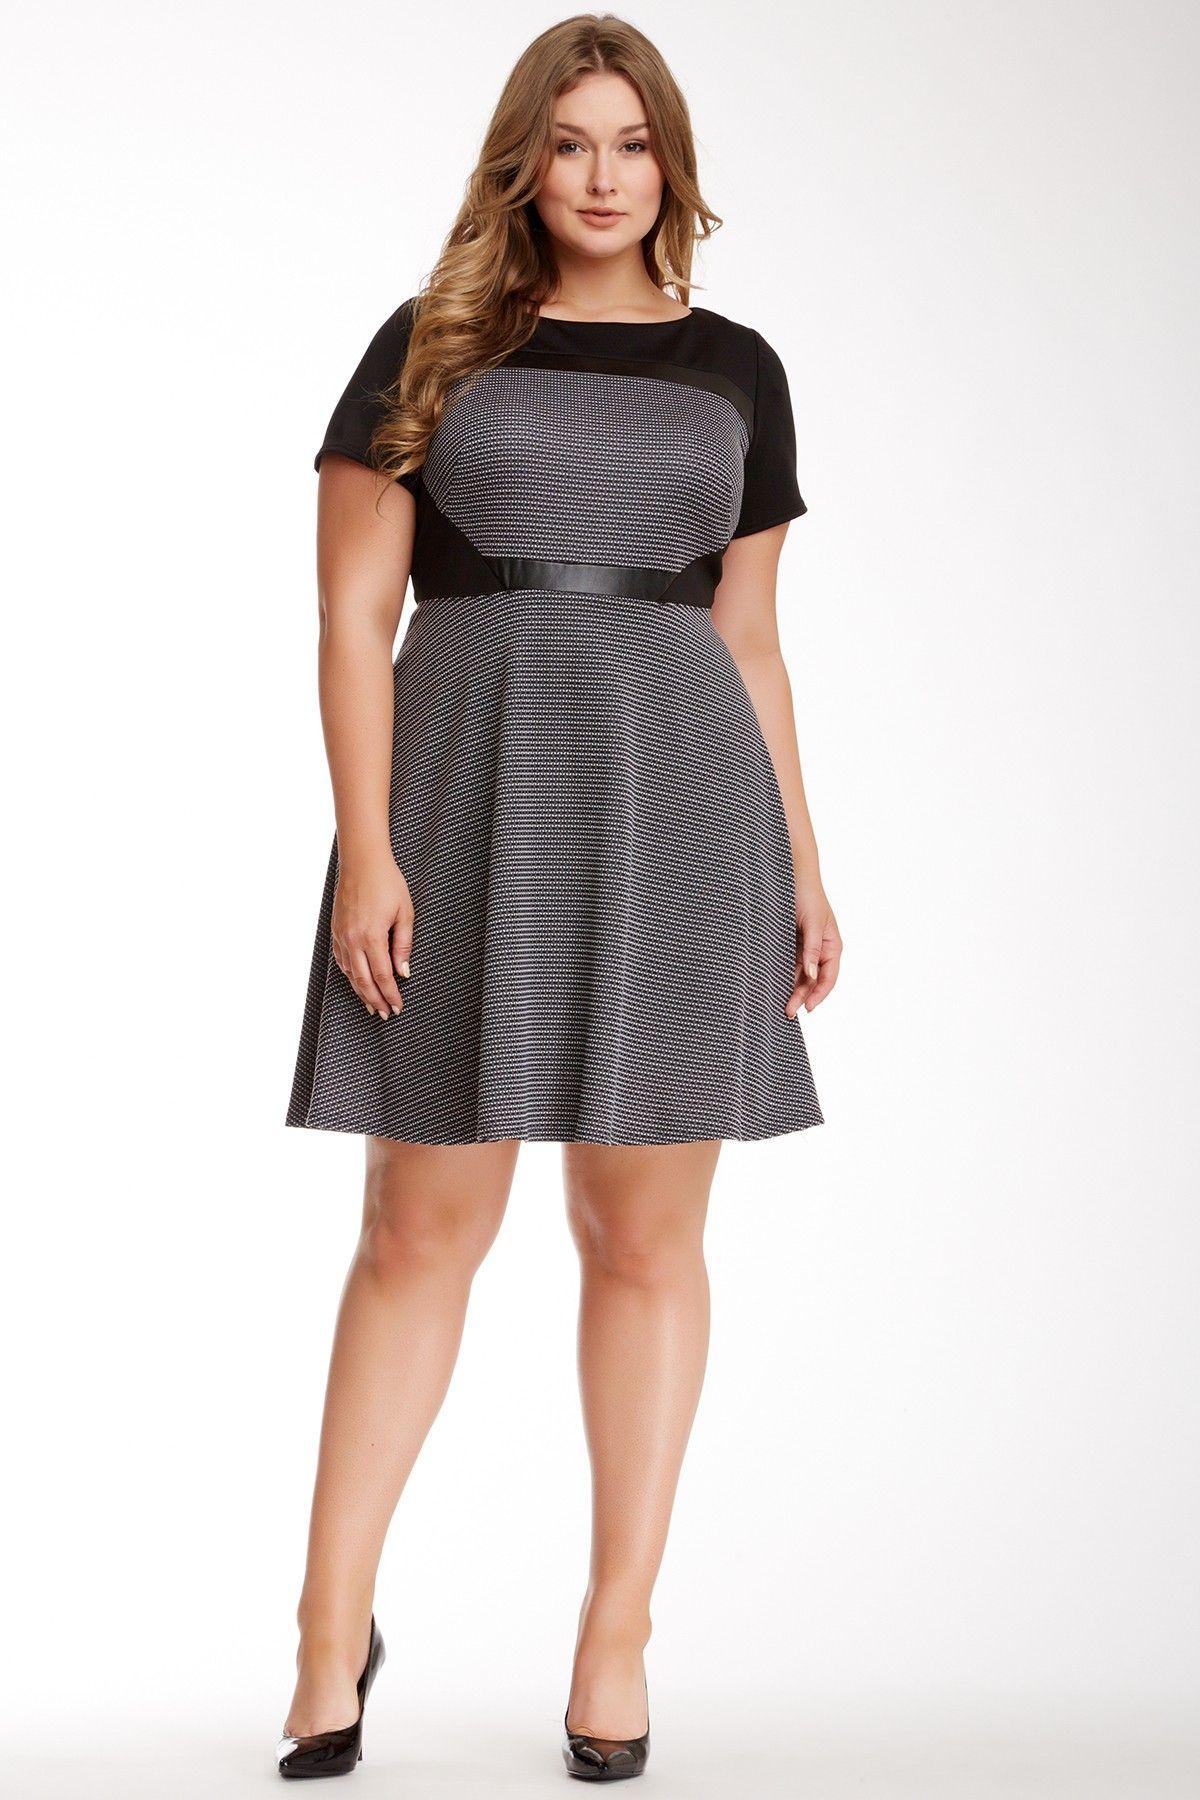 Pleather dress plus size